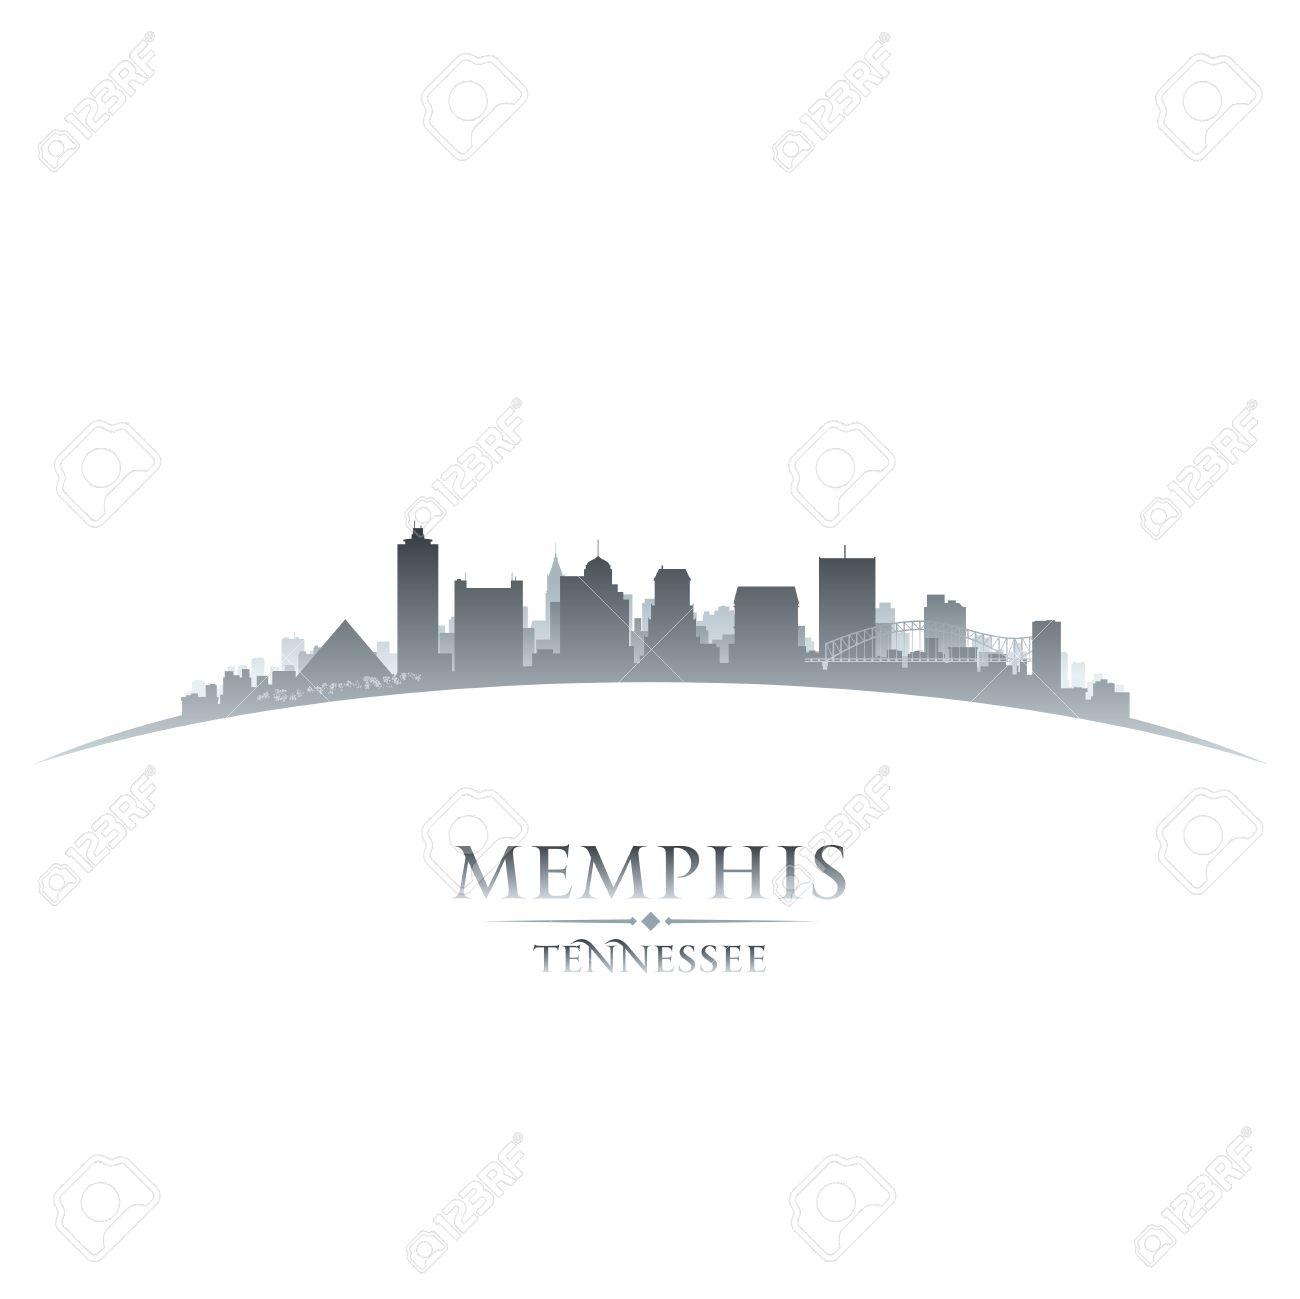 Memphis Tennessee city skyline silhouette. Vector illustration.